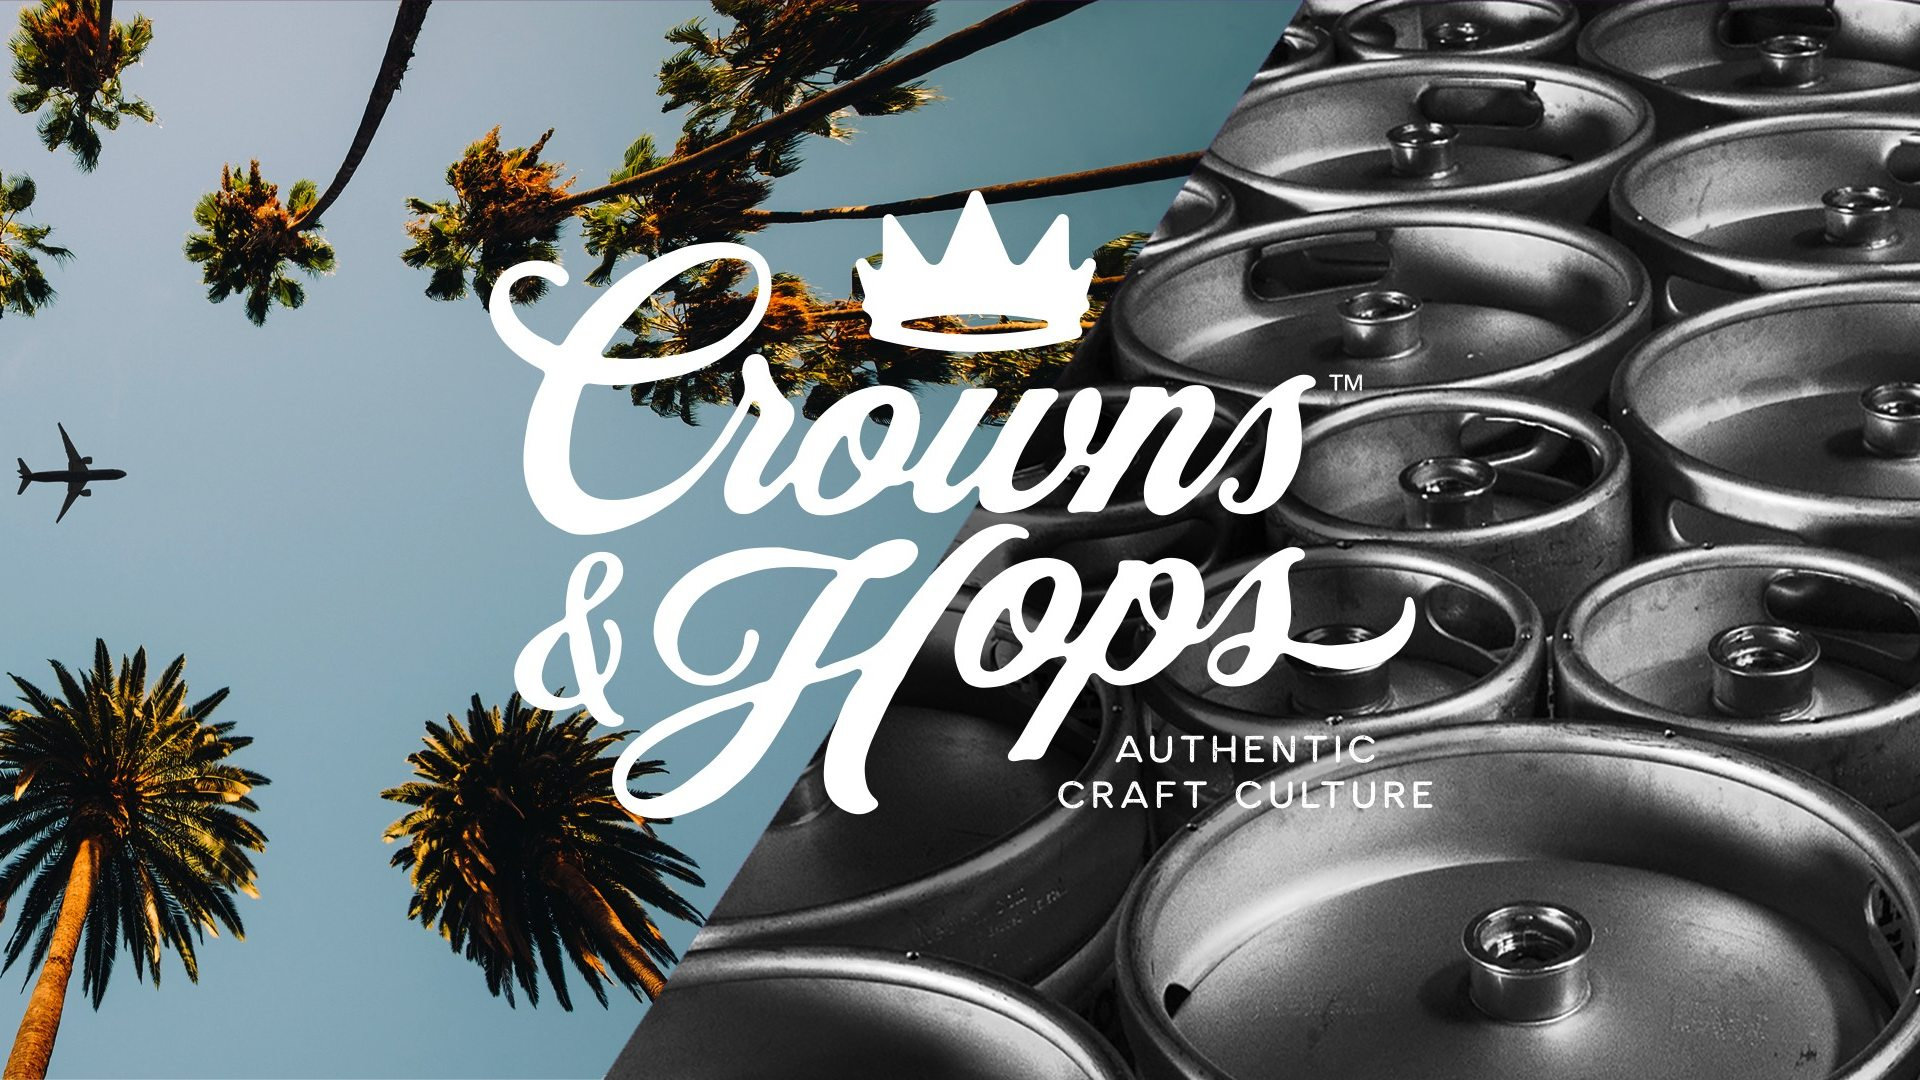 UNUM Case Study: Crowns and Hops Craft Beer